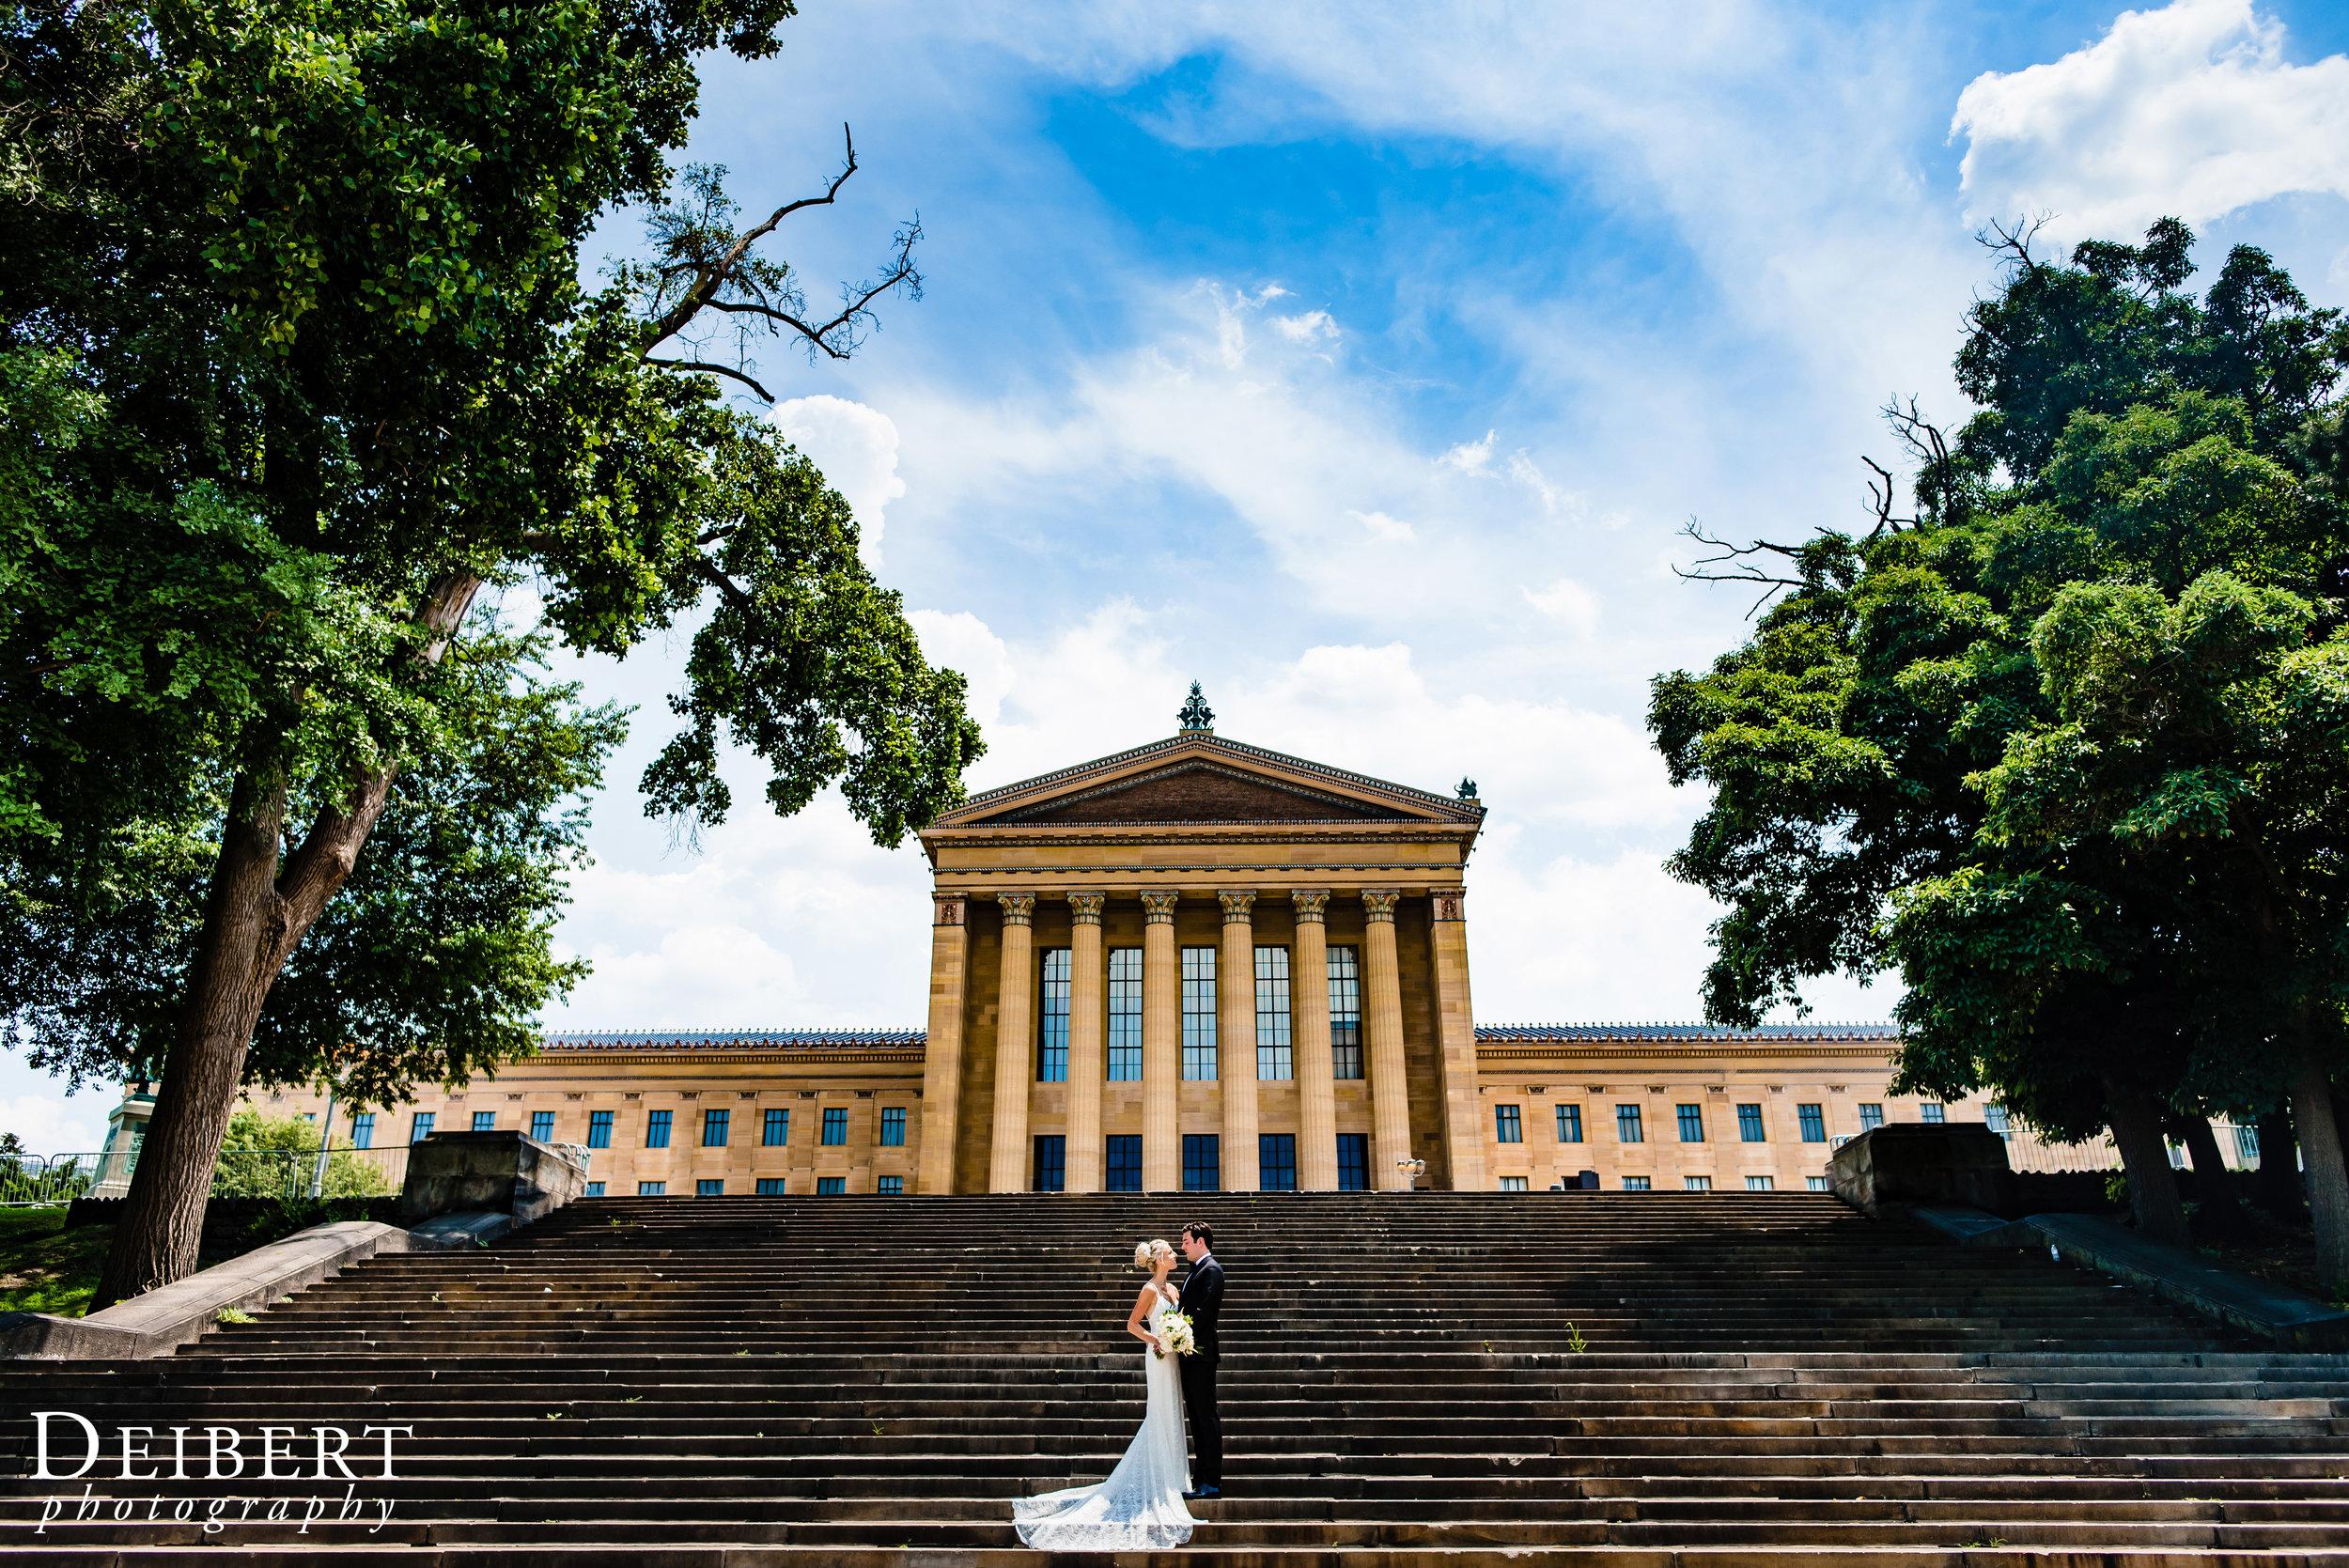 College_of_physicians_wedding-2.jpg